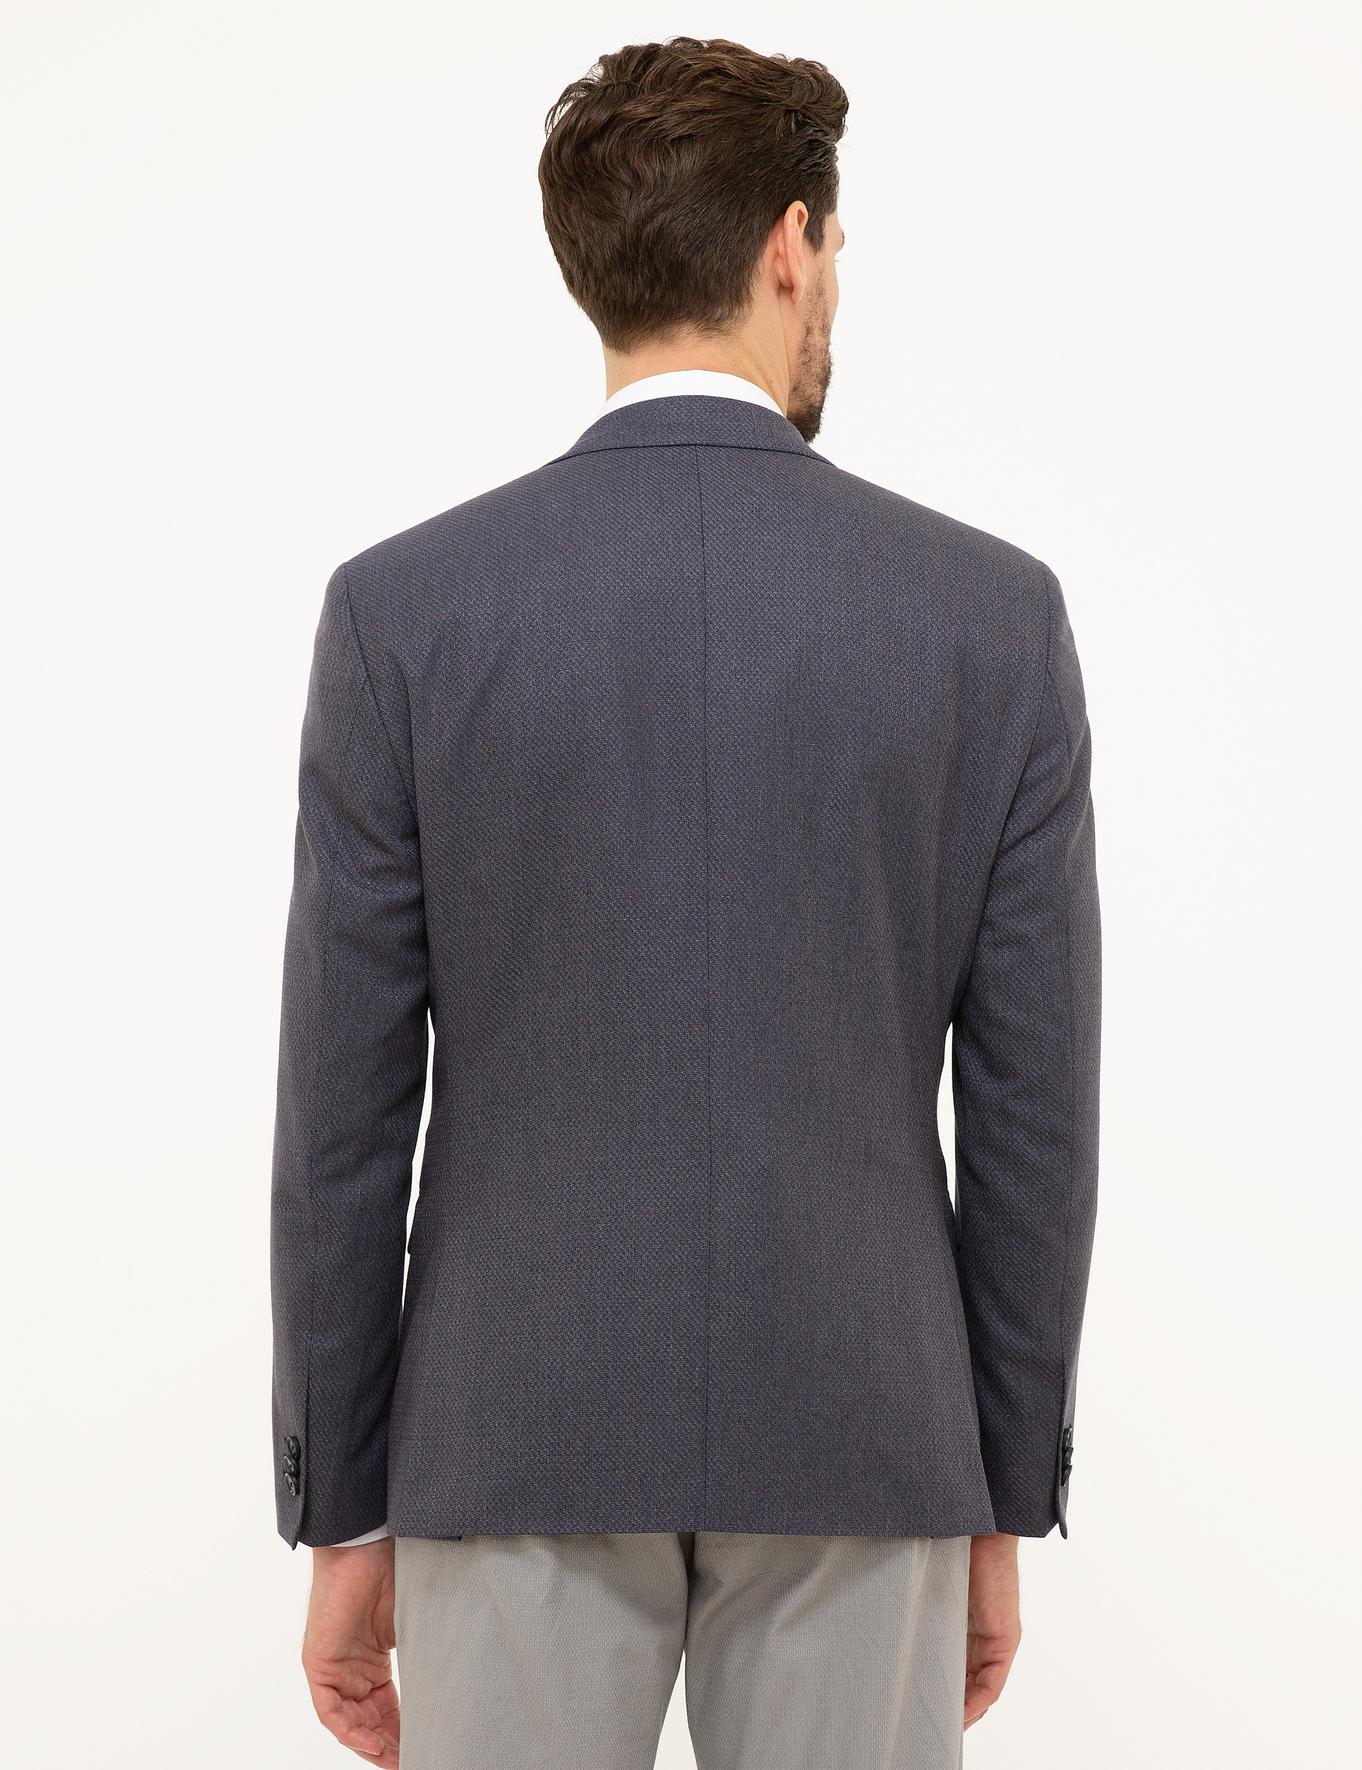 Gri Slim Fit Ceket